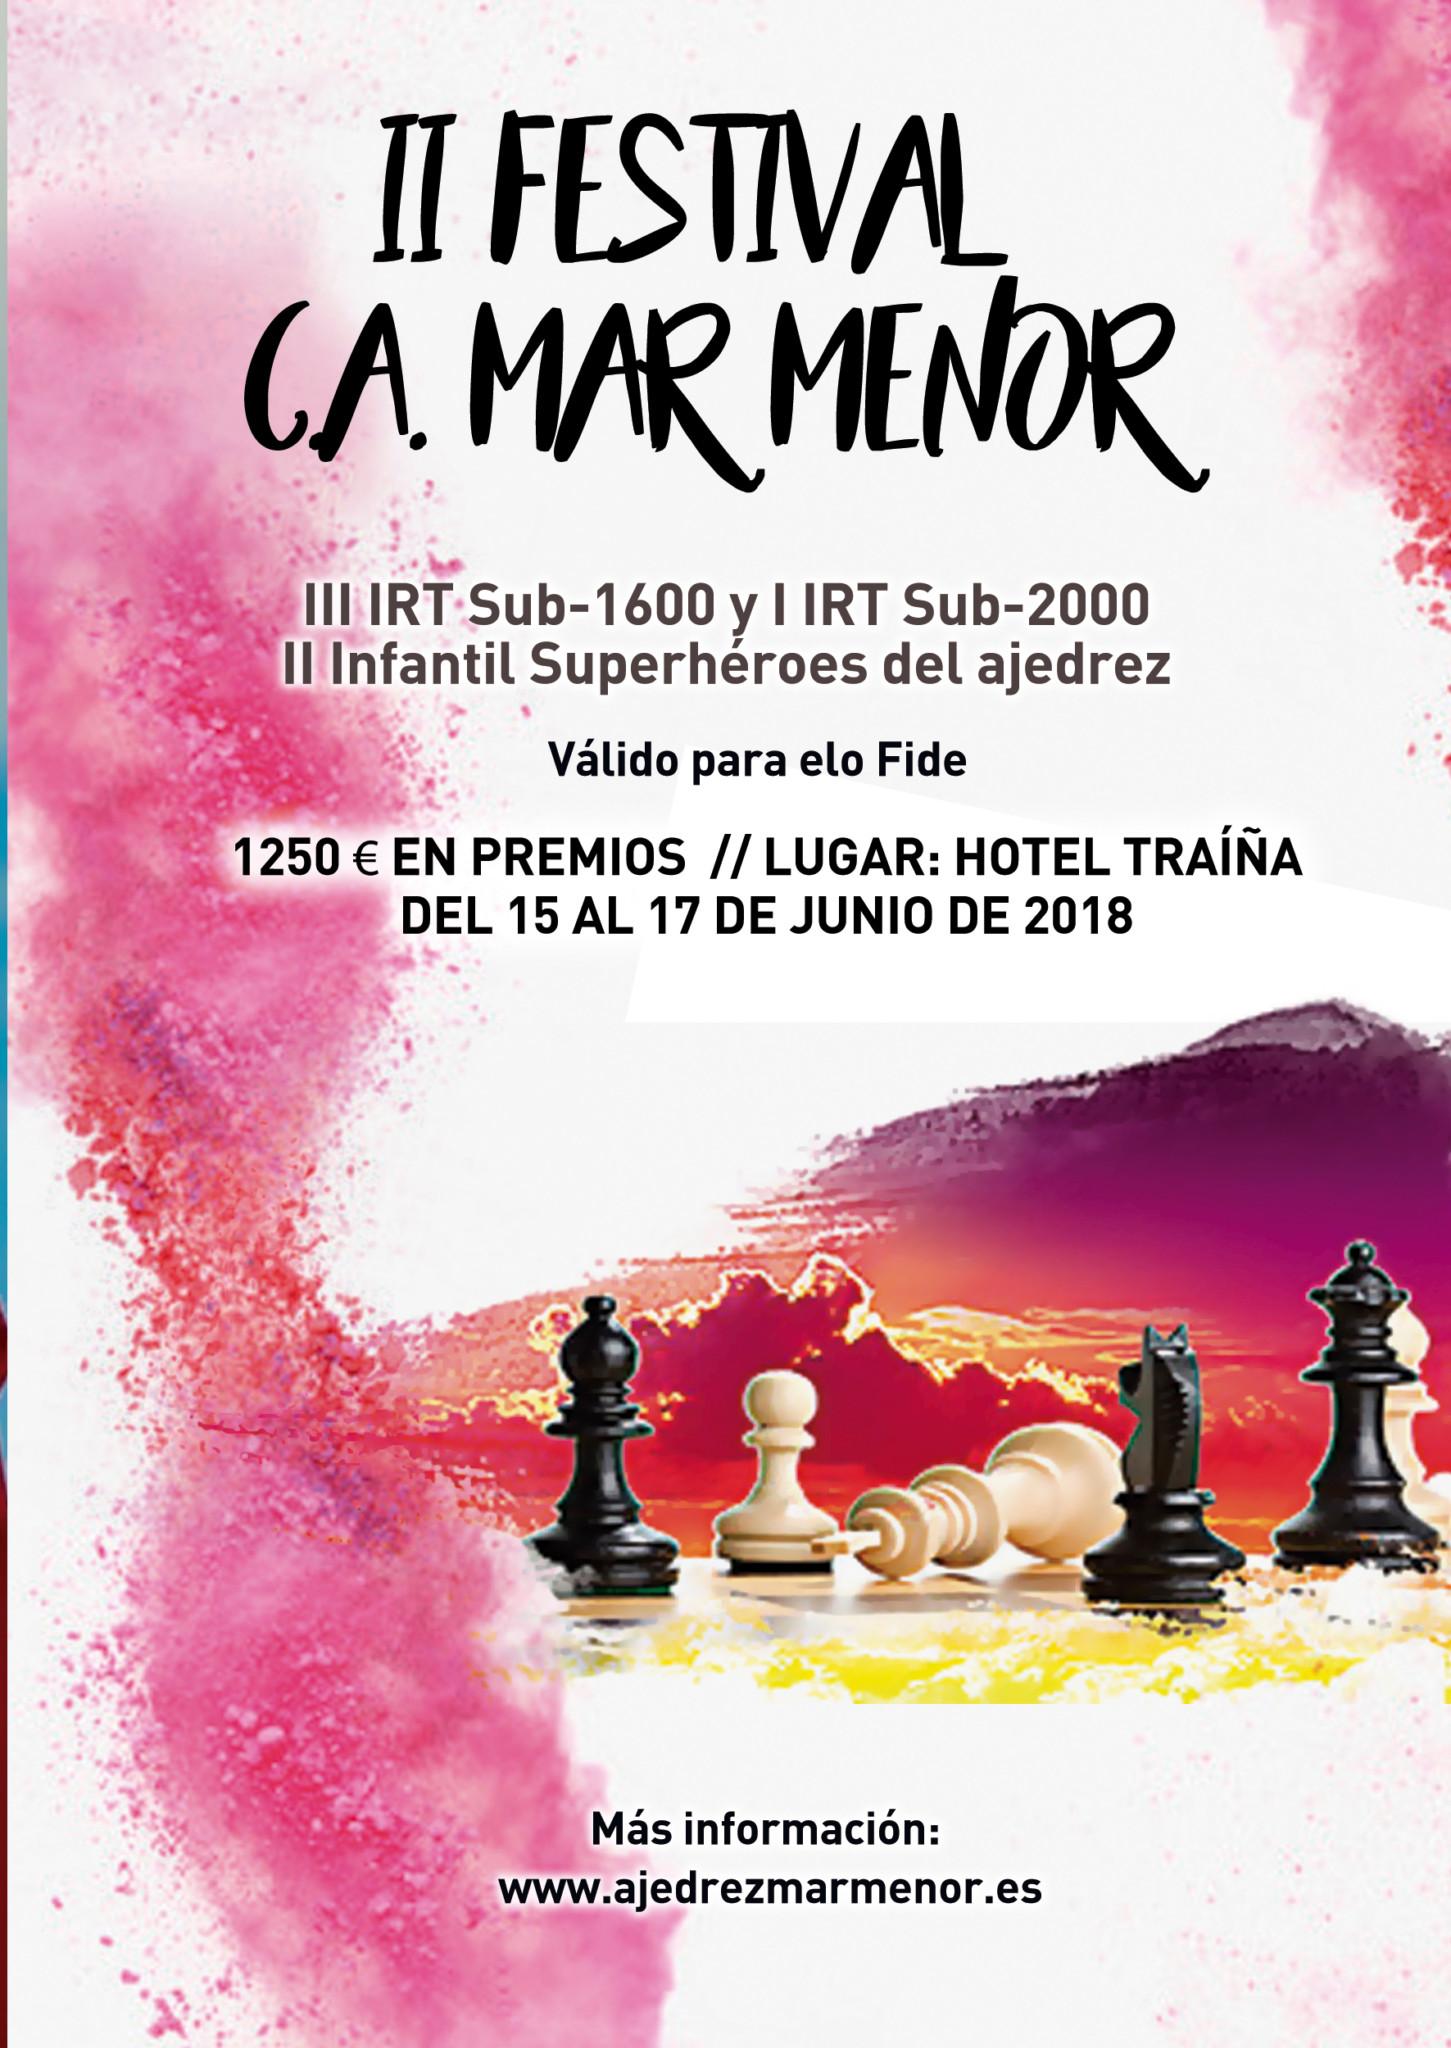 II Festival C.A. Mar Menor